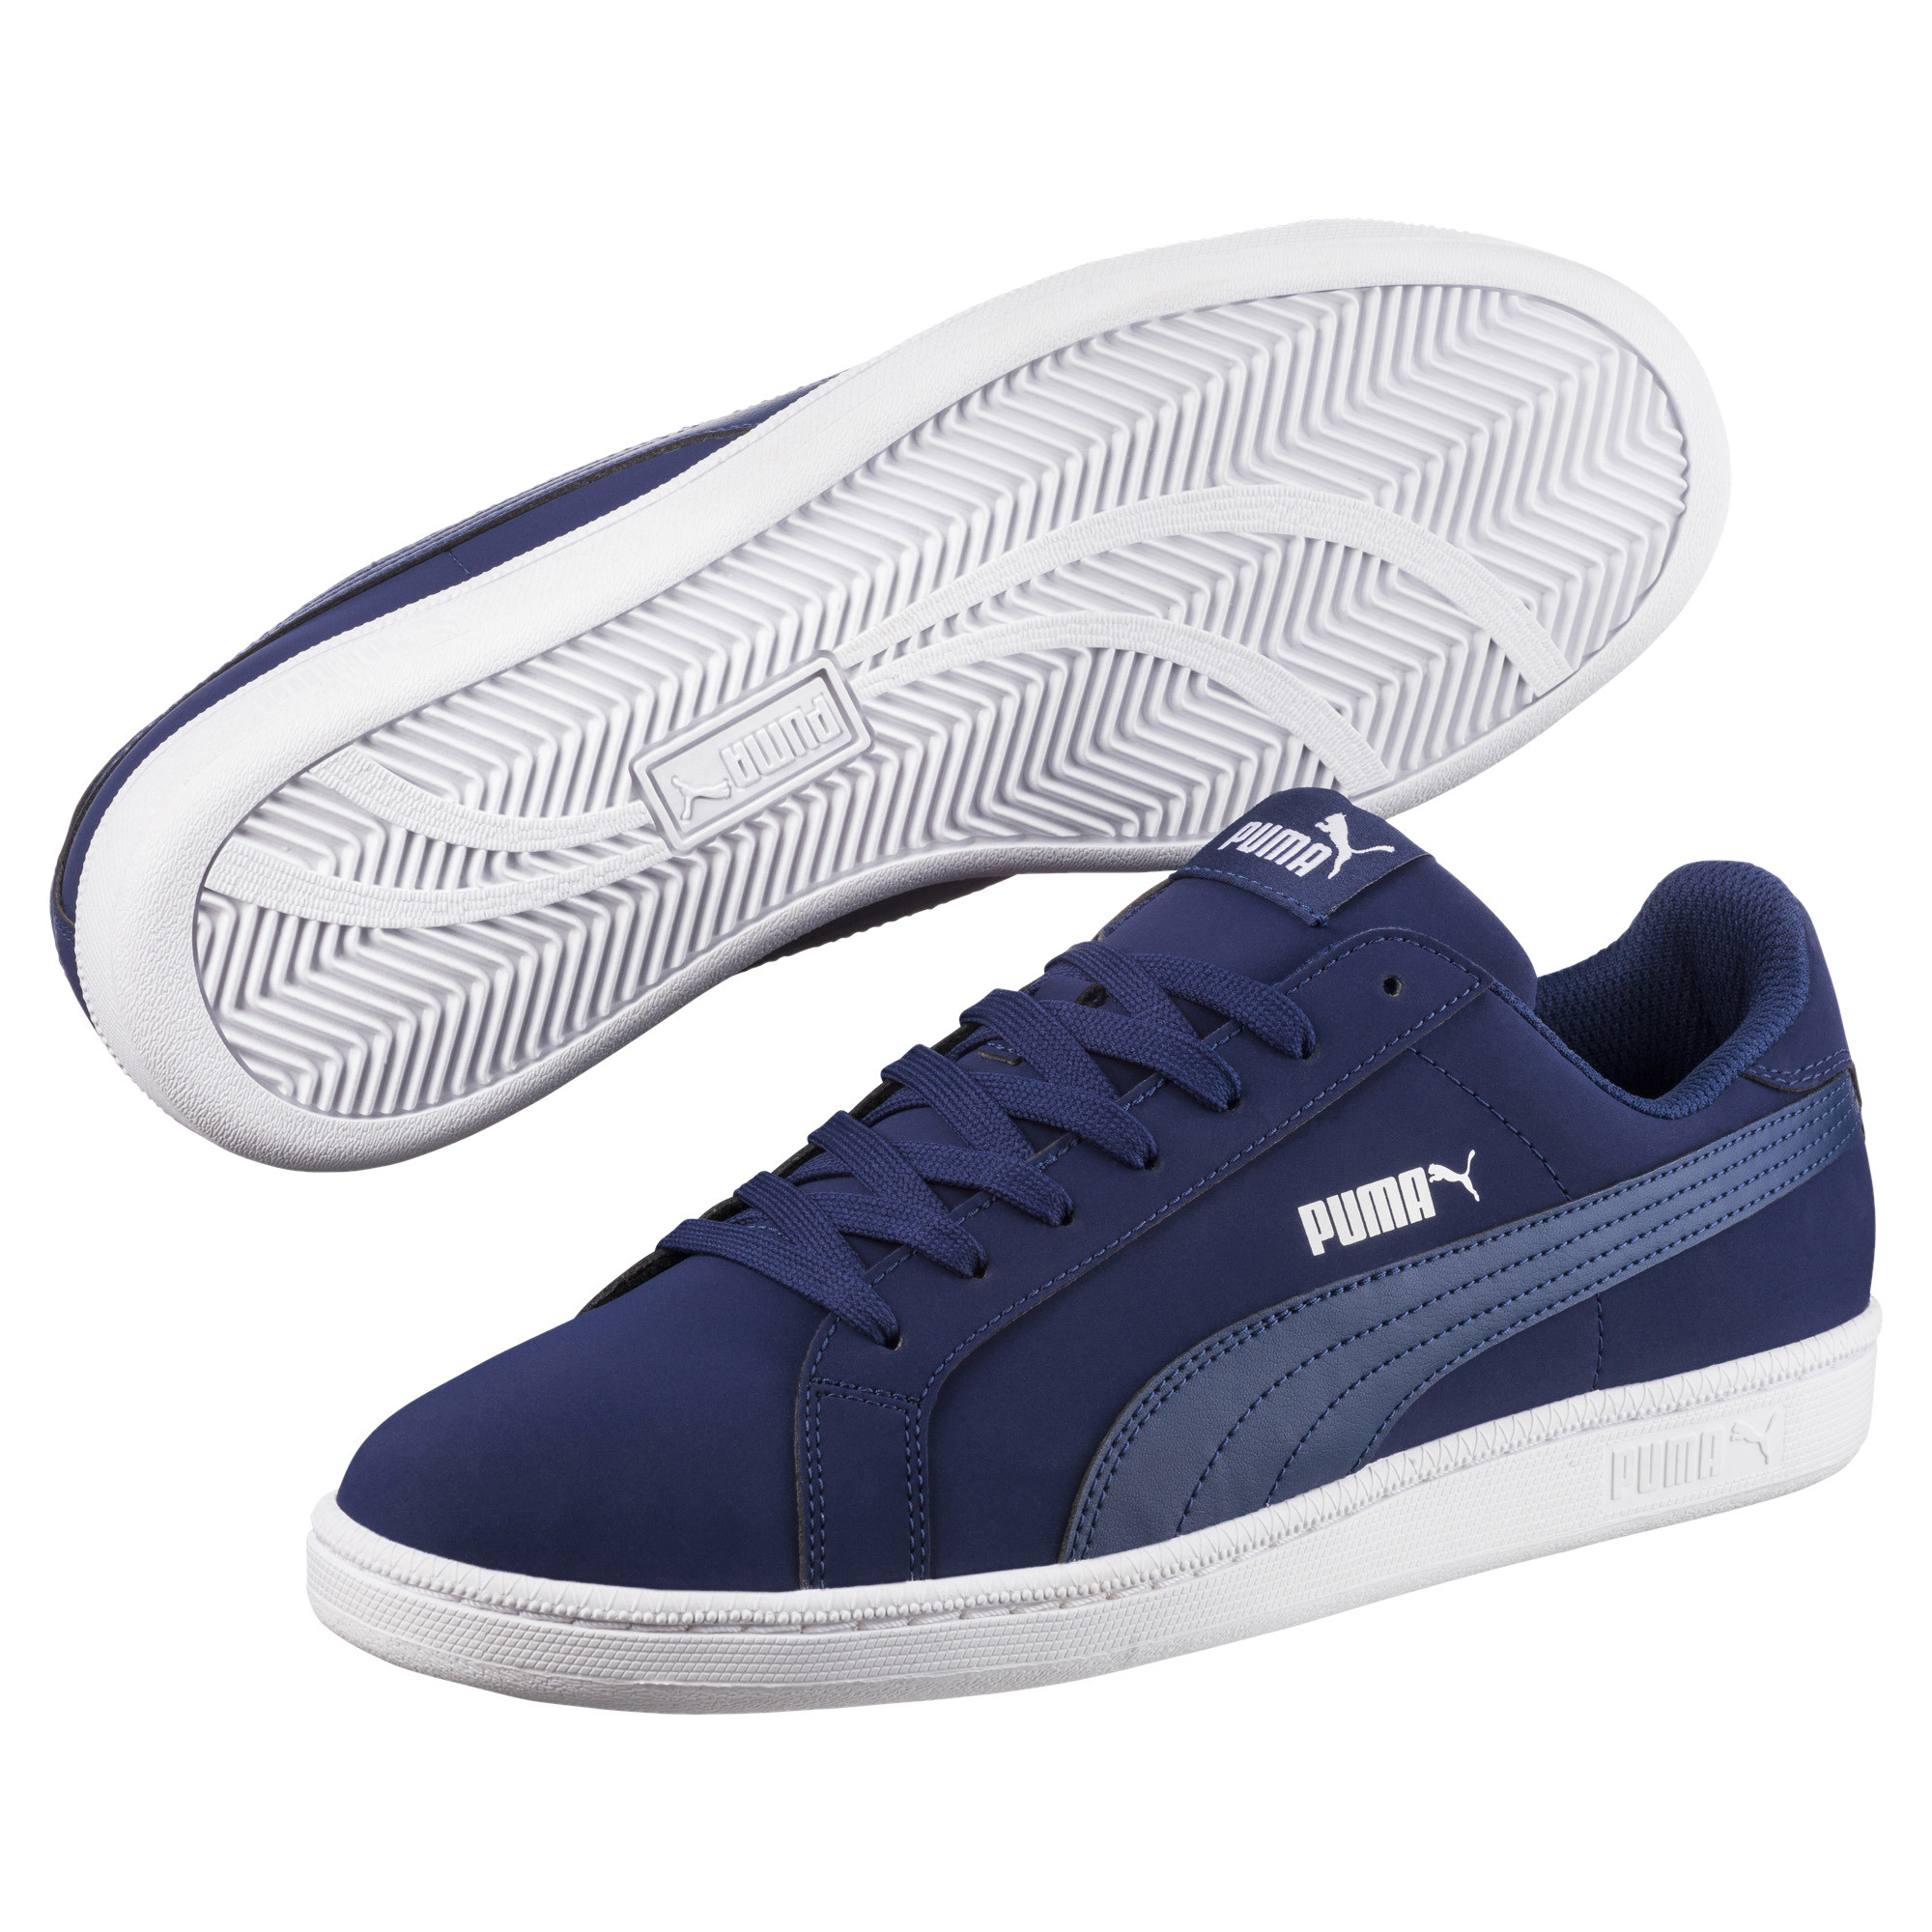 Indexbild 7 - PUMA Smash Buck Sneaker Unisex Schuhe Sport Classics Neu